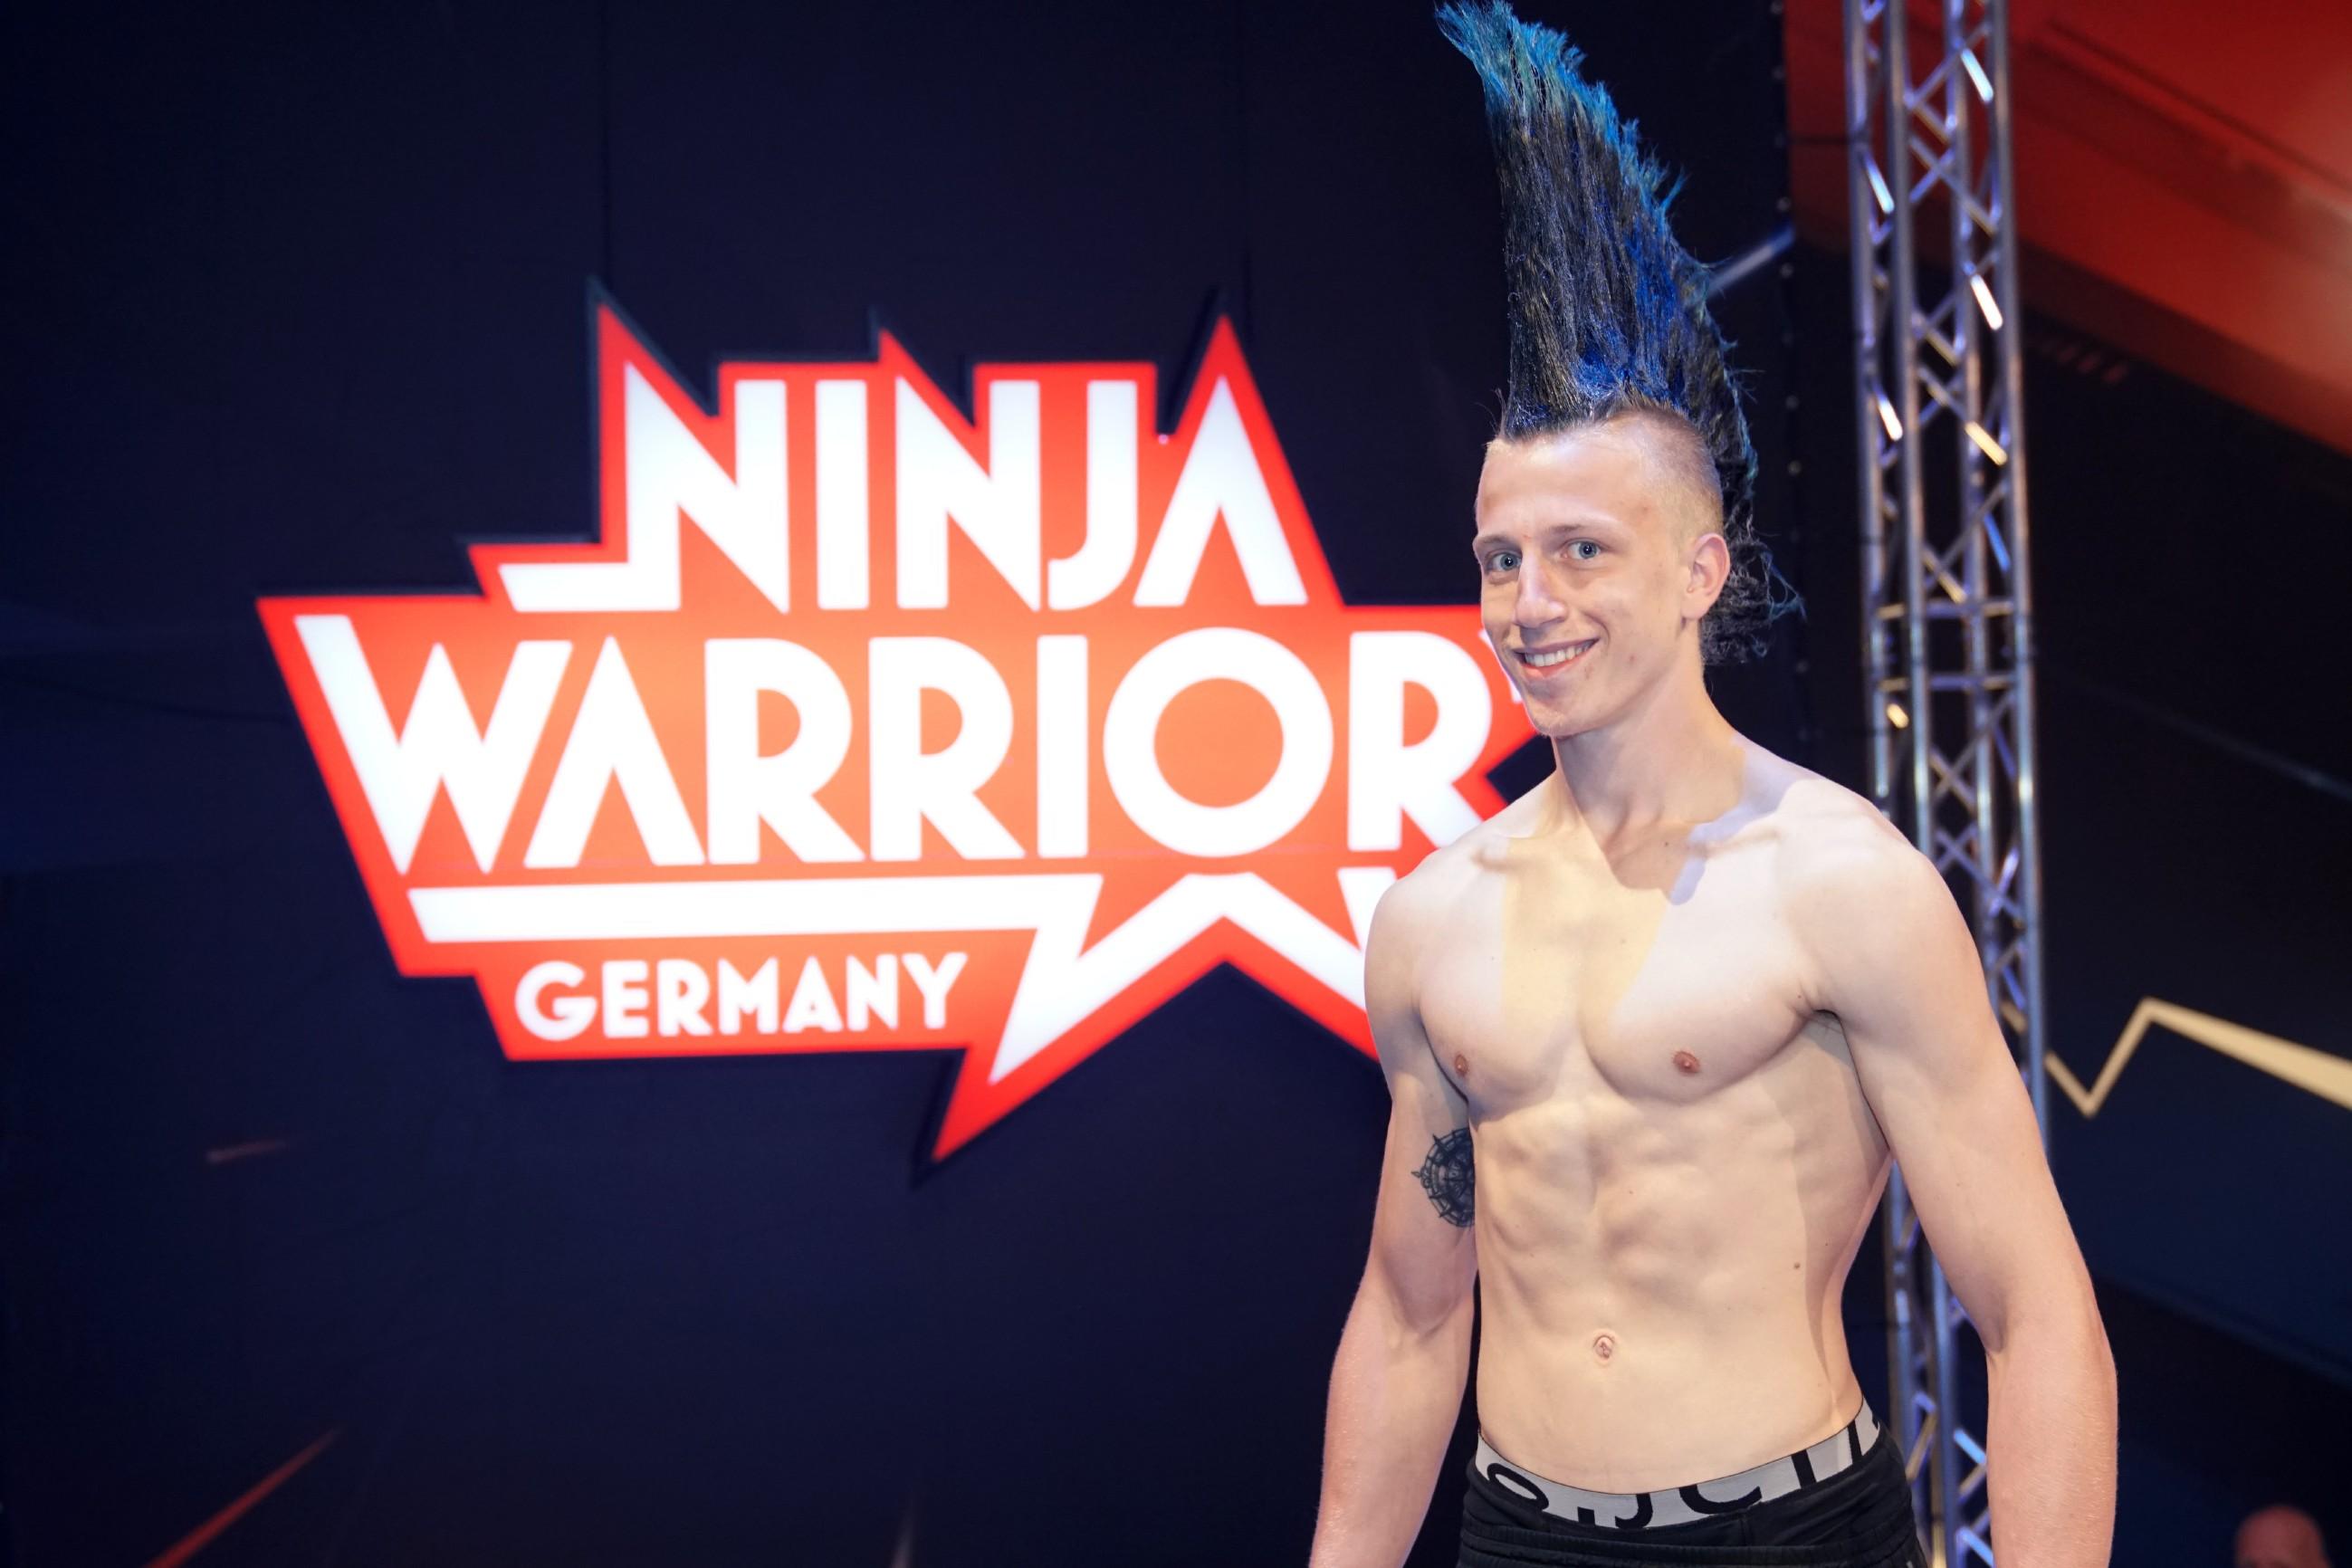 Ninja Warrior Germany 2017 - Matthias Clementi